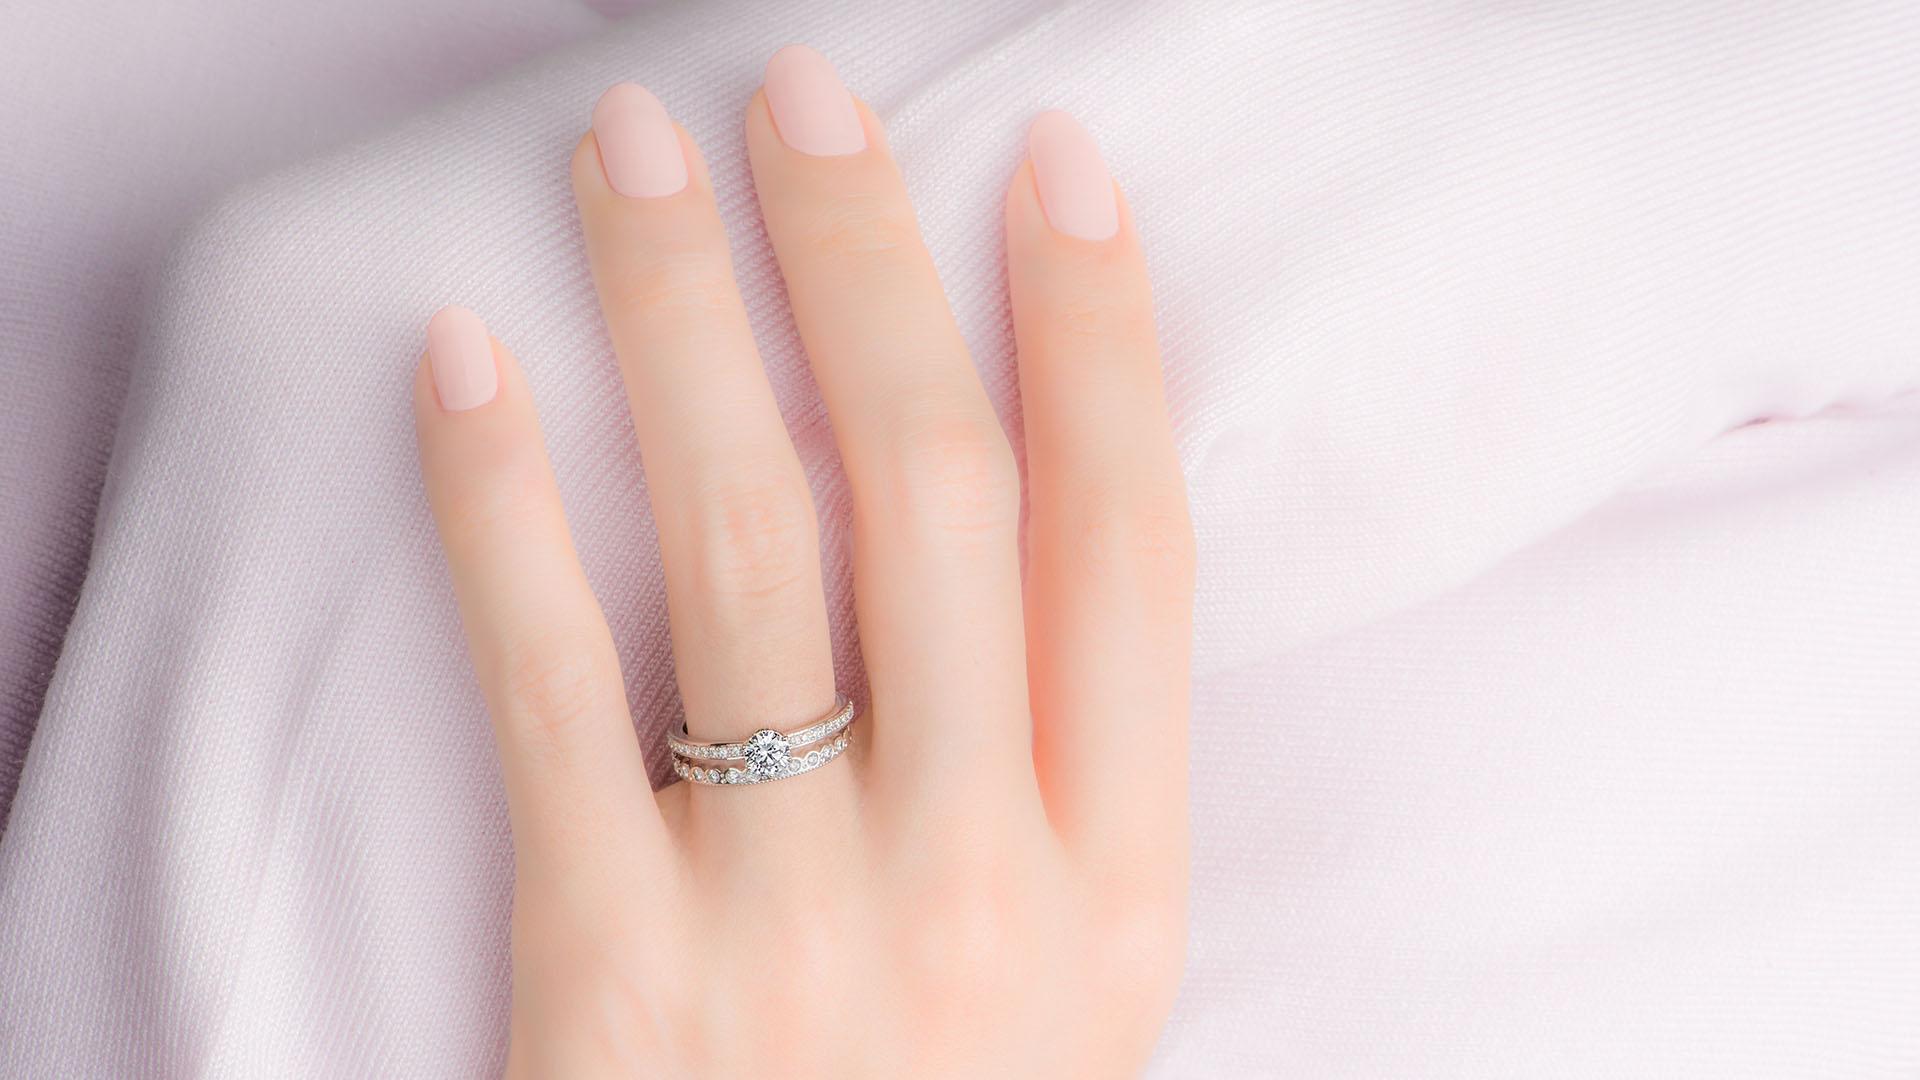 ariadne アリアドネ   結婚指輪サムネイル 2